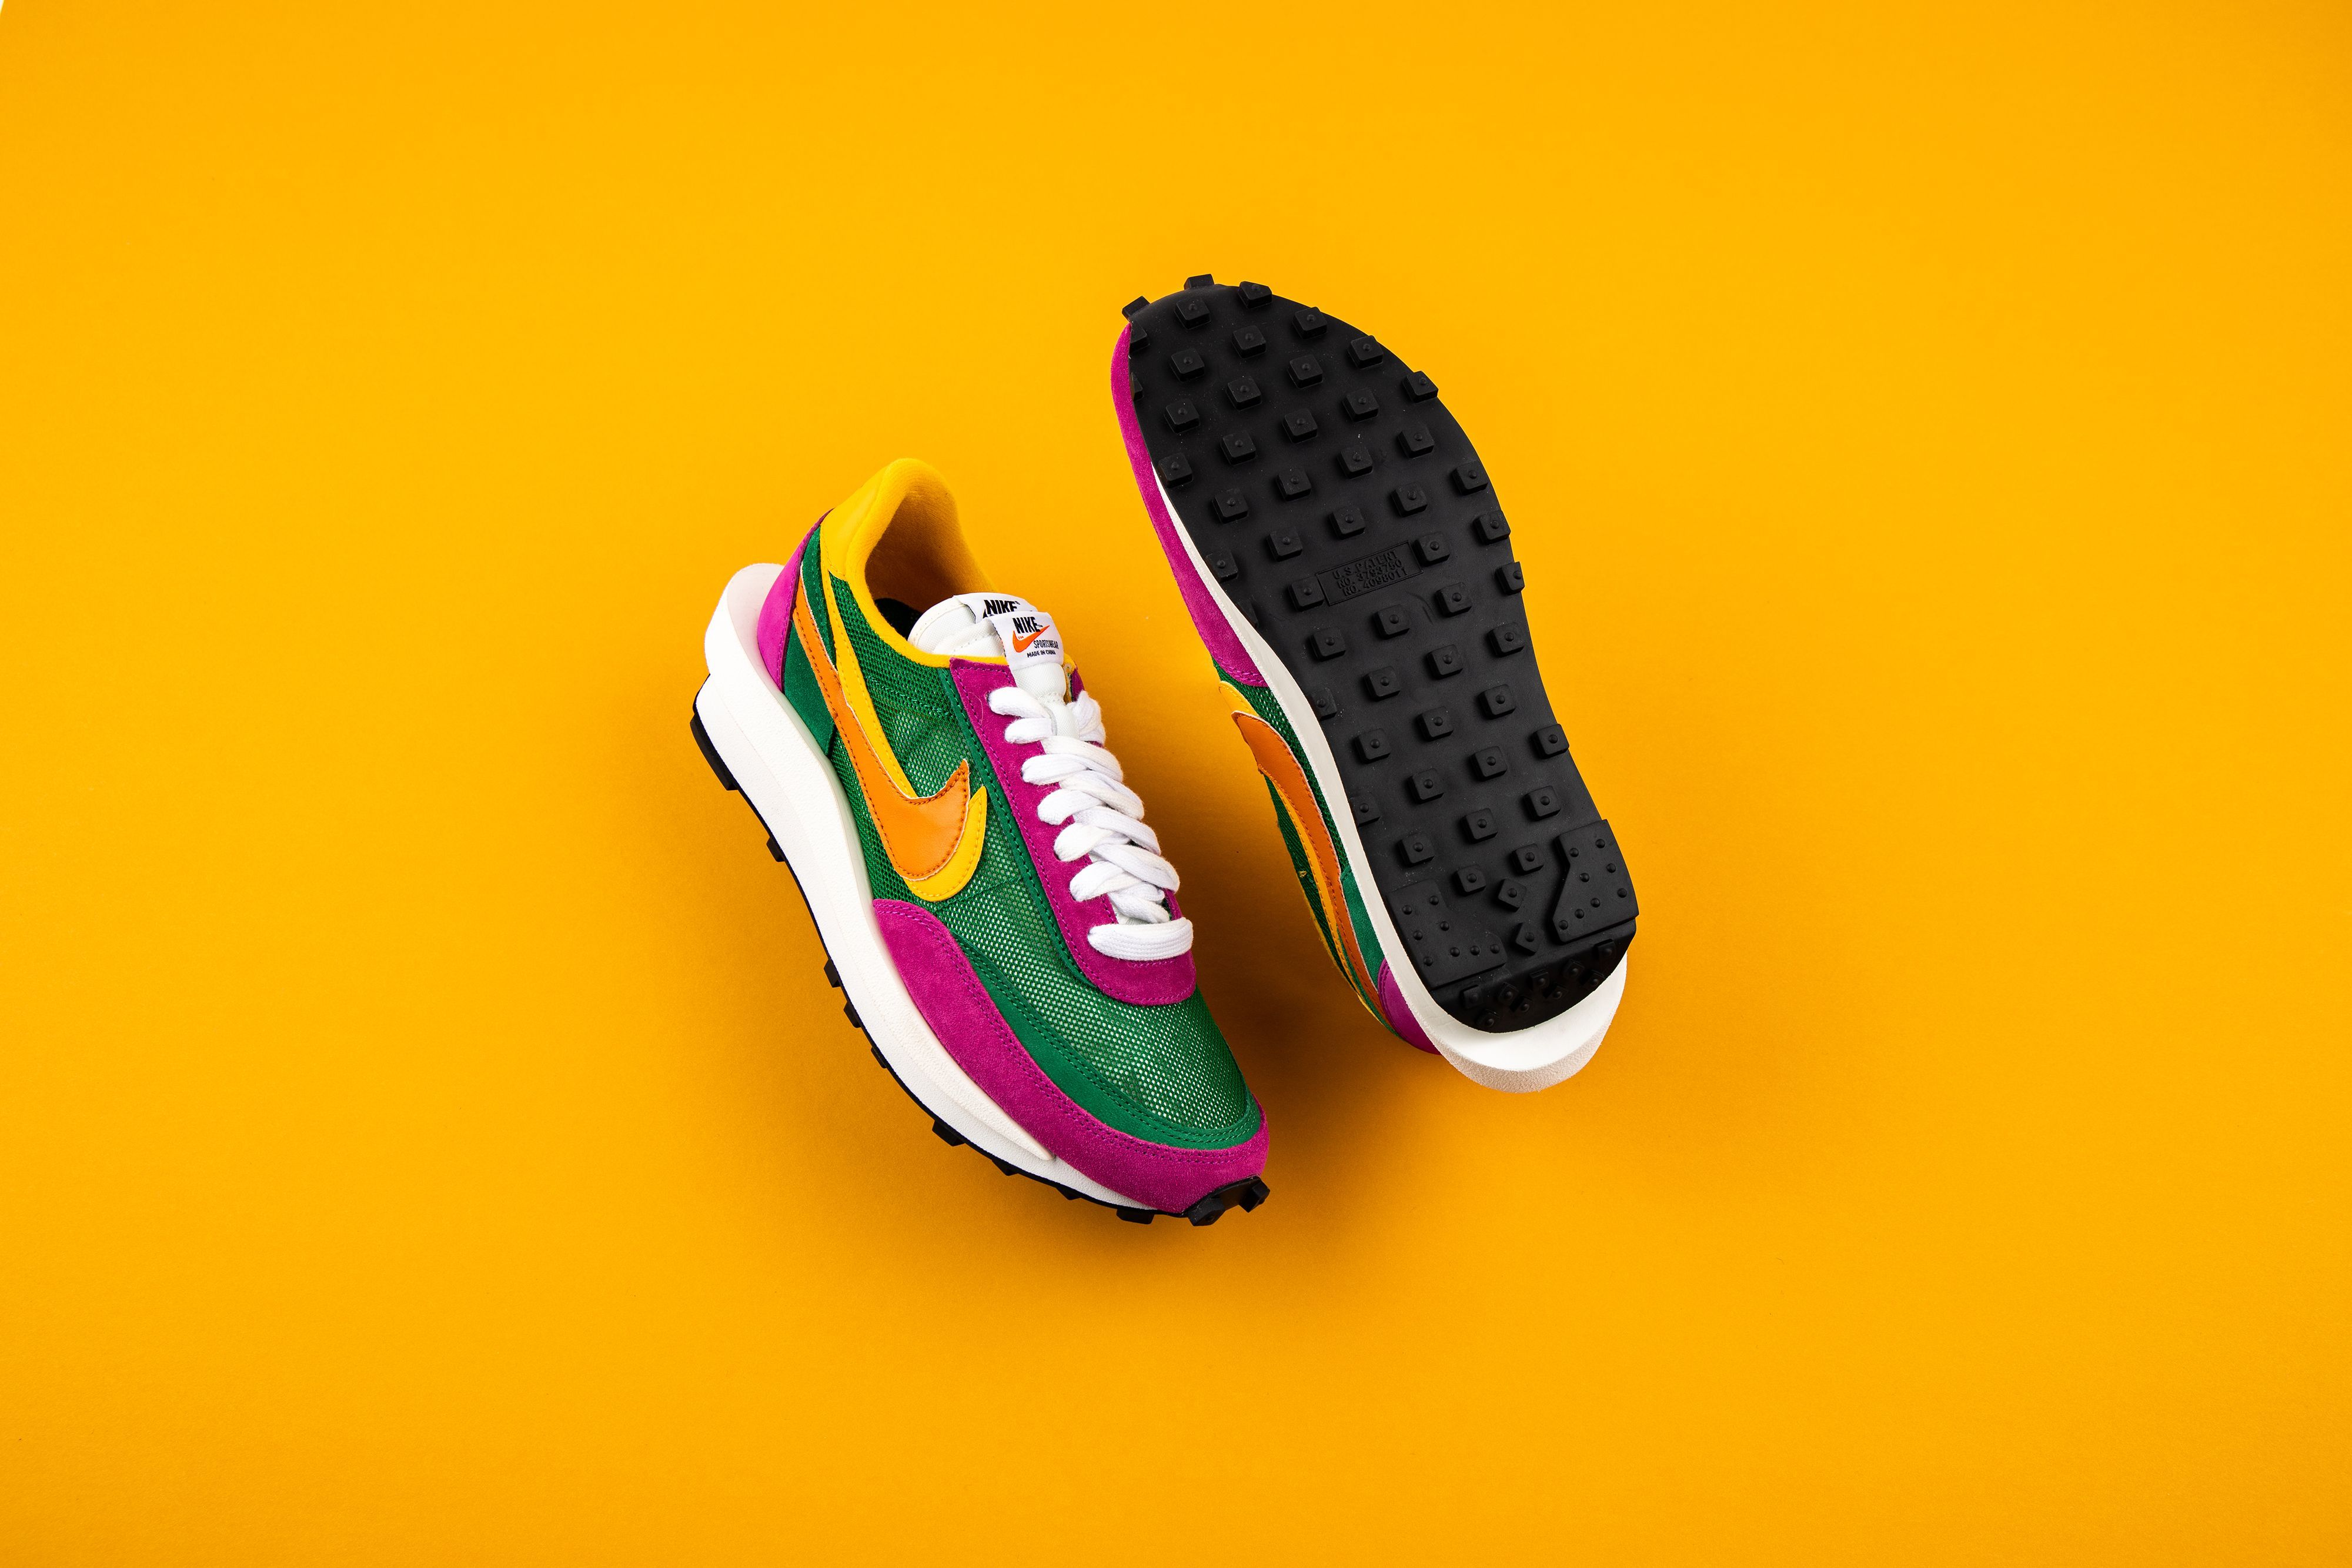 Nike Ldwaffle Sacai Pine Green Bv0073 301 2021 In 2021 Nike Nike Waffle Sacai